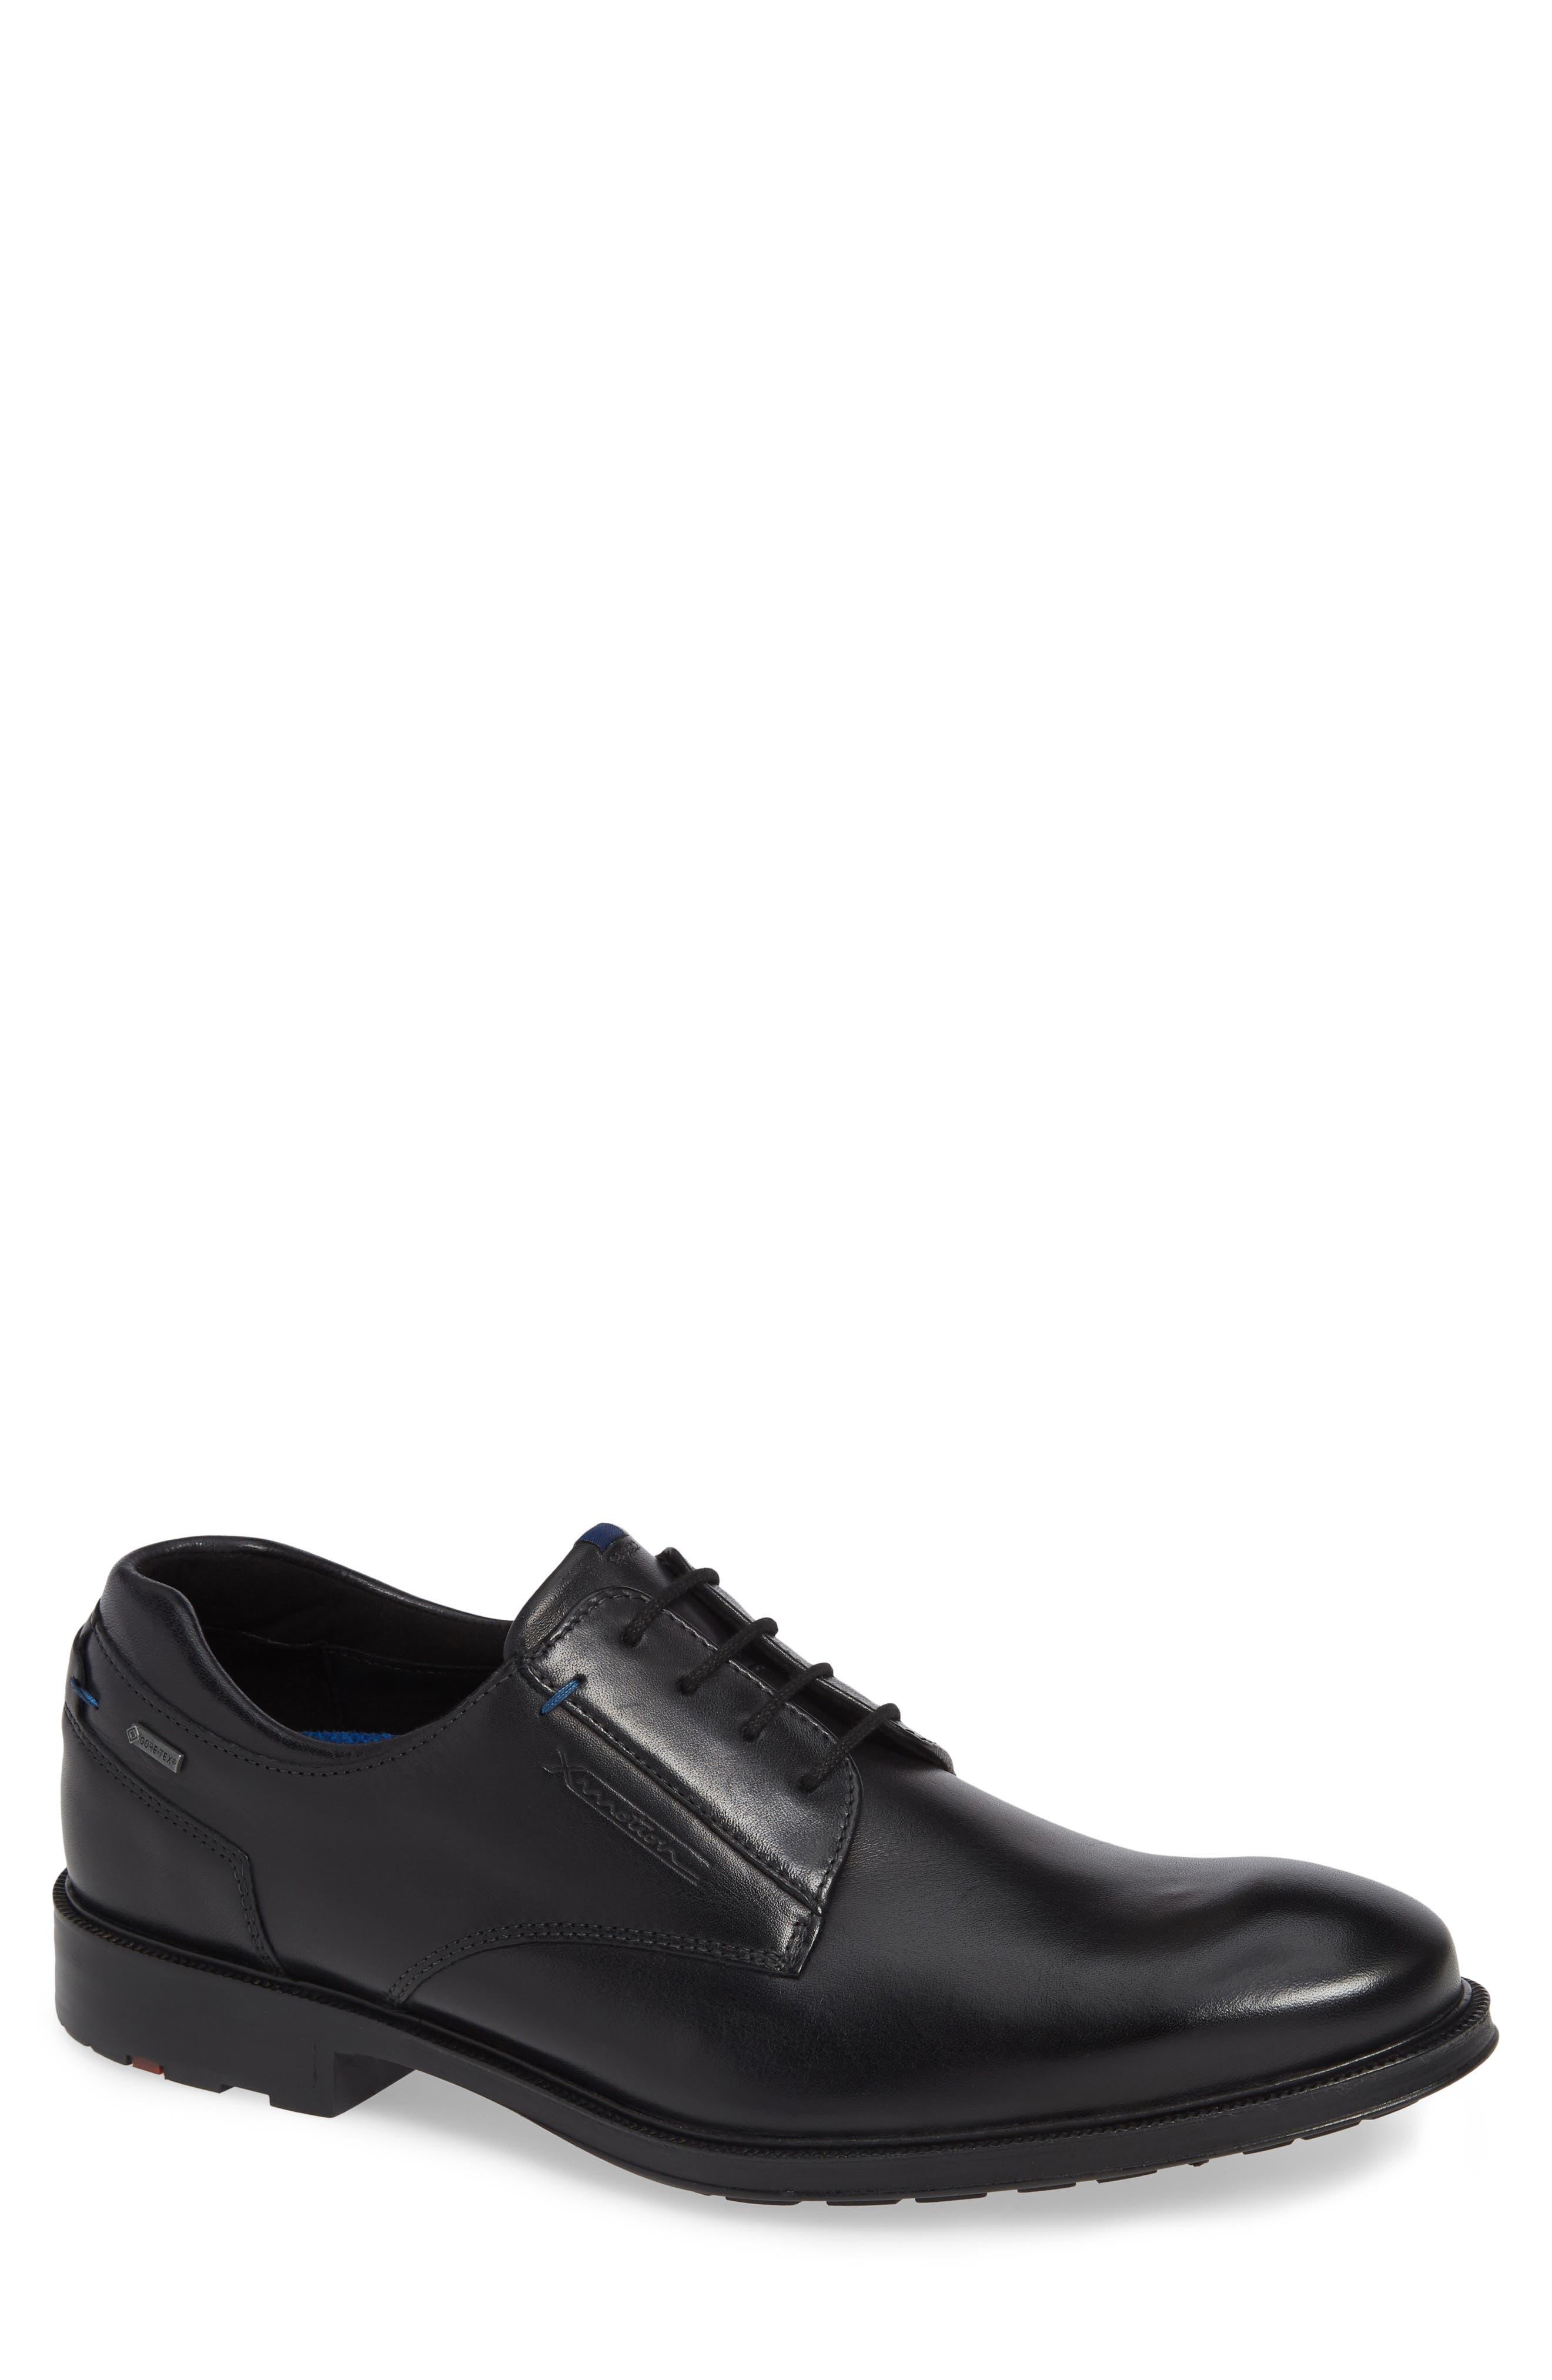 Veria Gore-Tex<sup>®</sup> Plain Toe Derby,                         Main,                         color, BLACK LEATHER